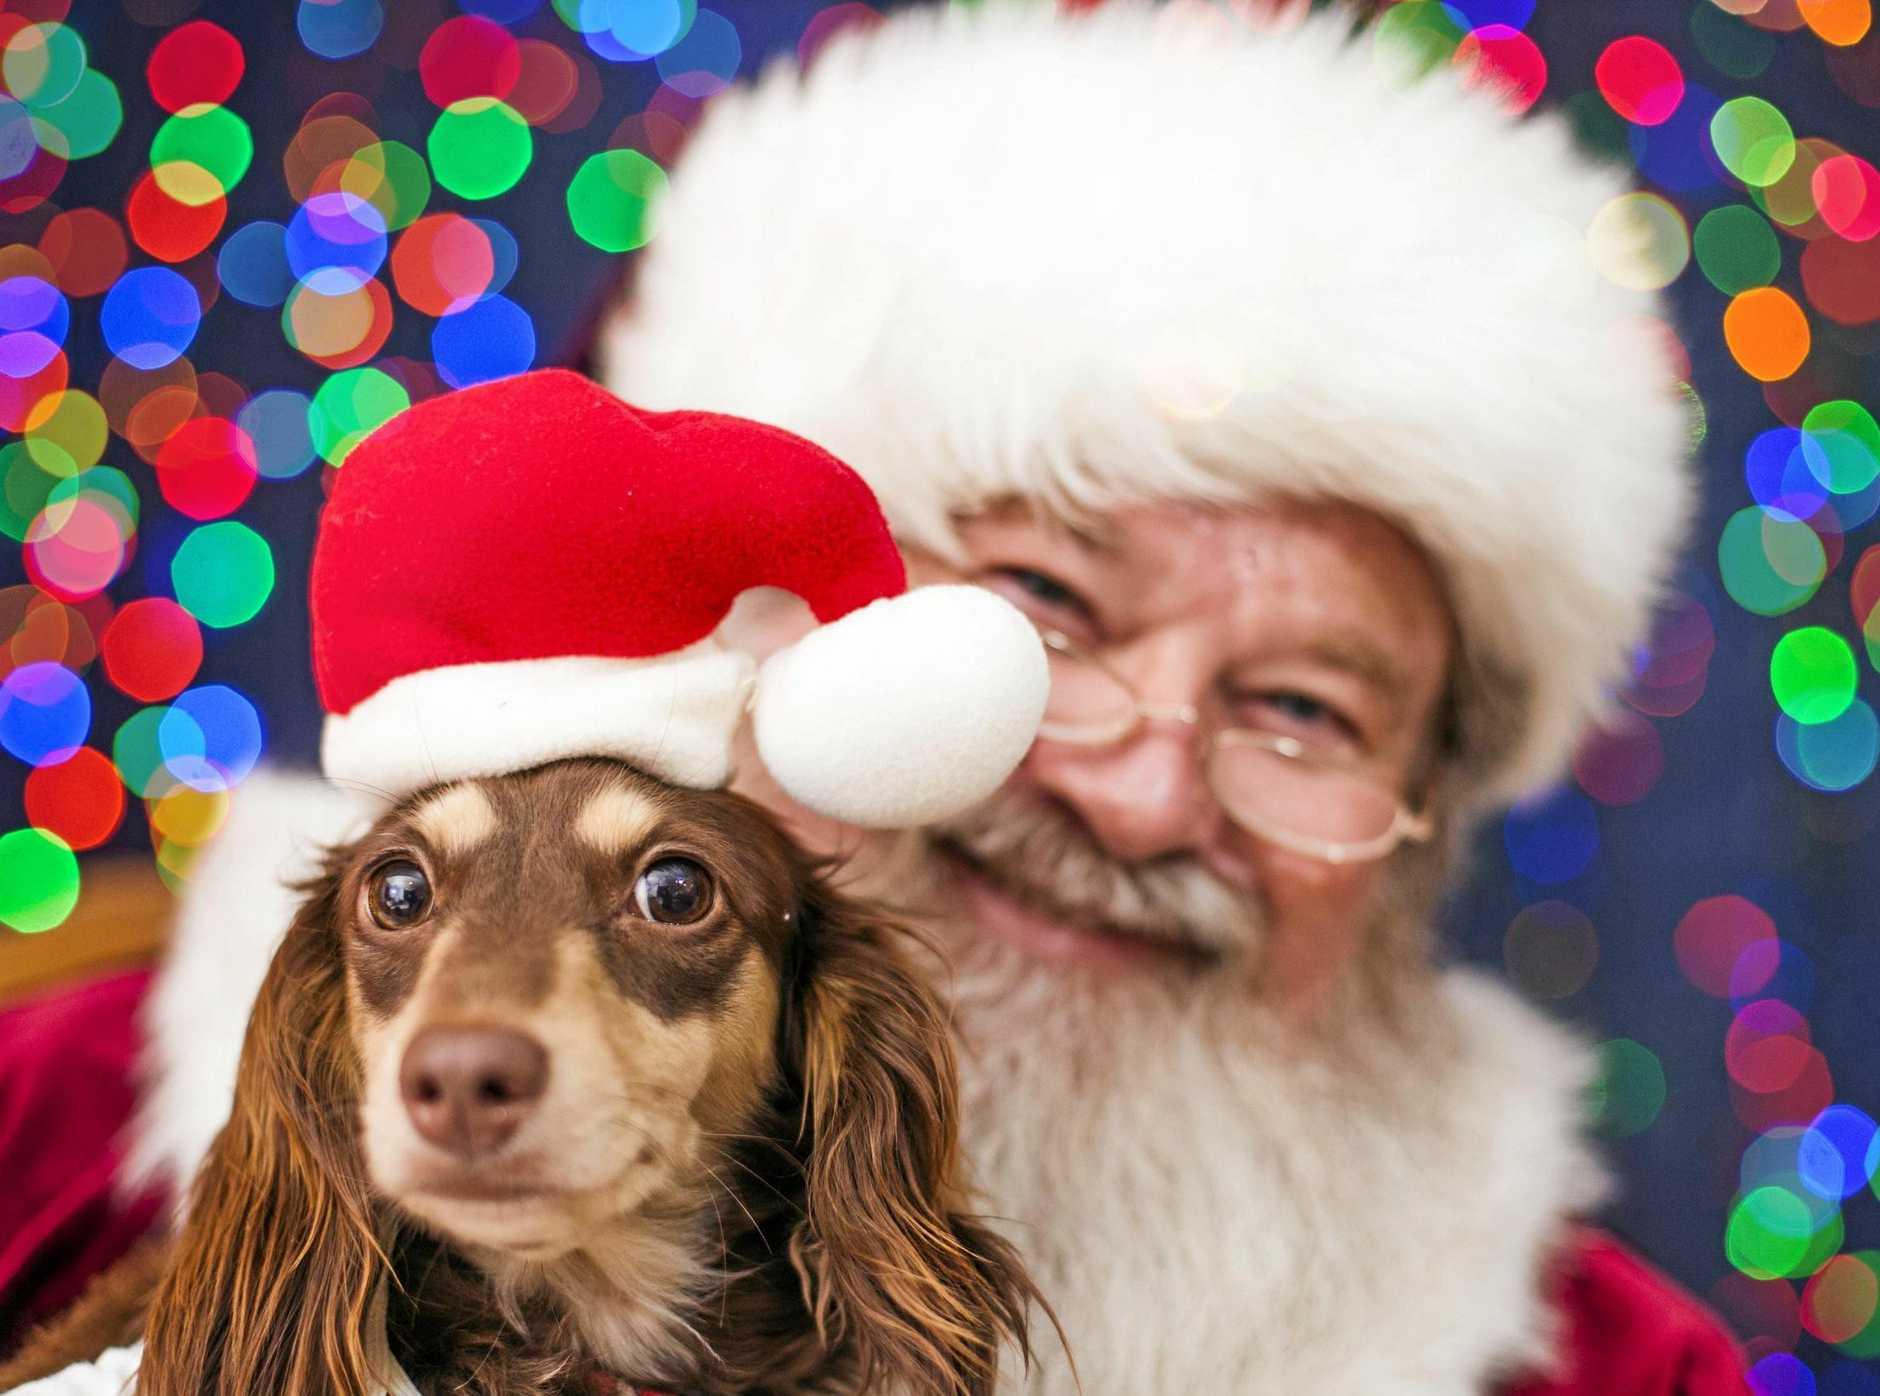 Santa is on his way!